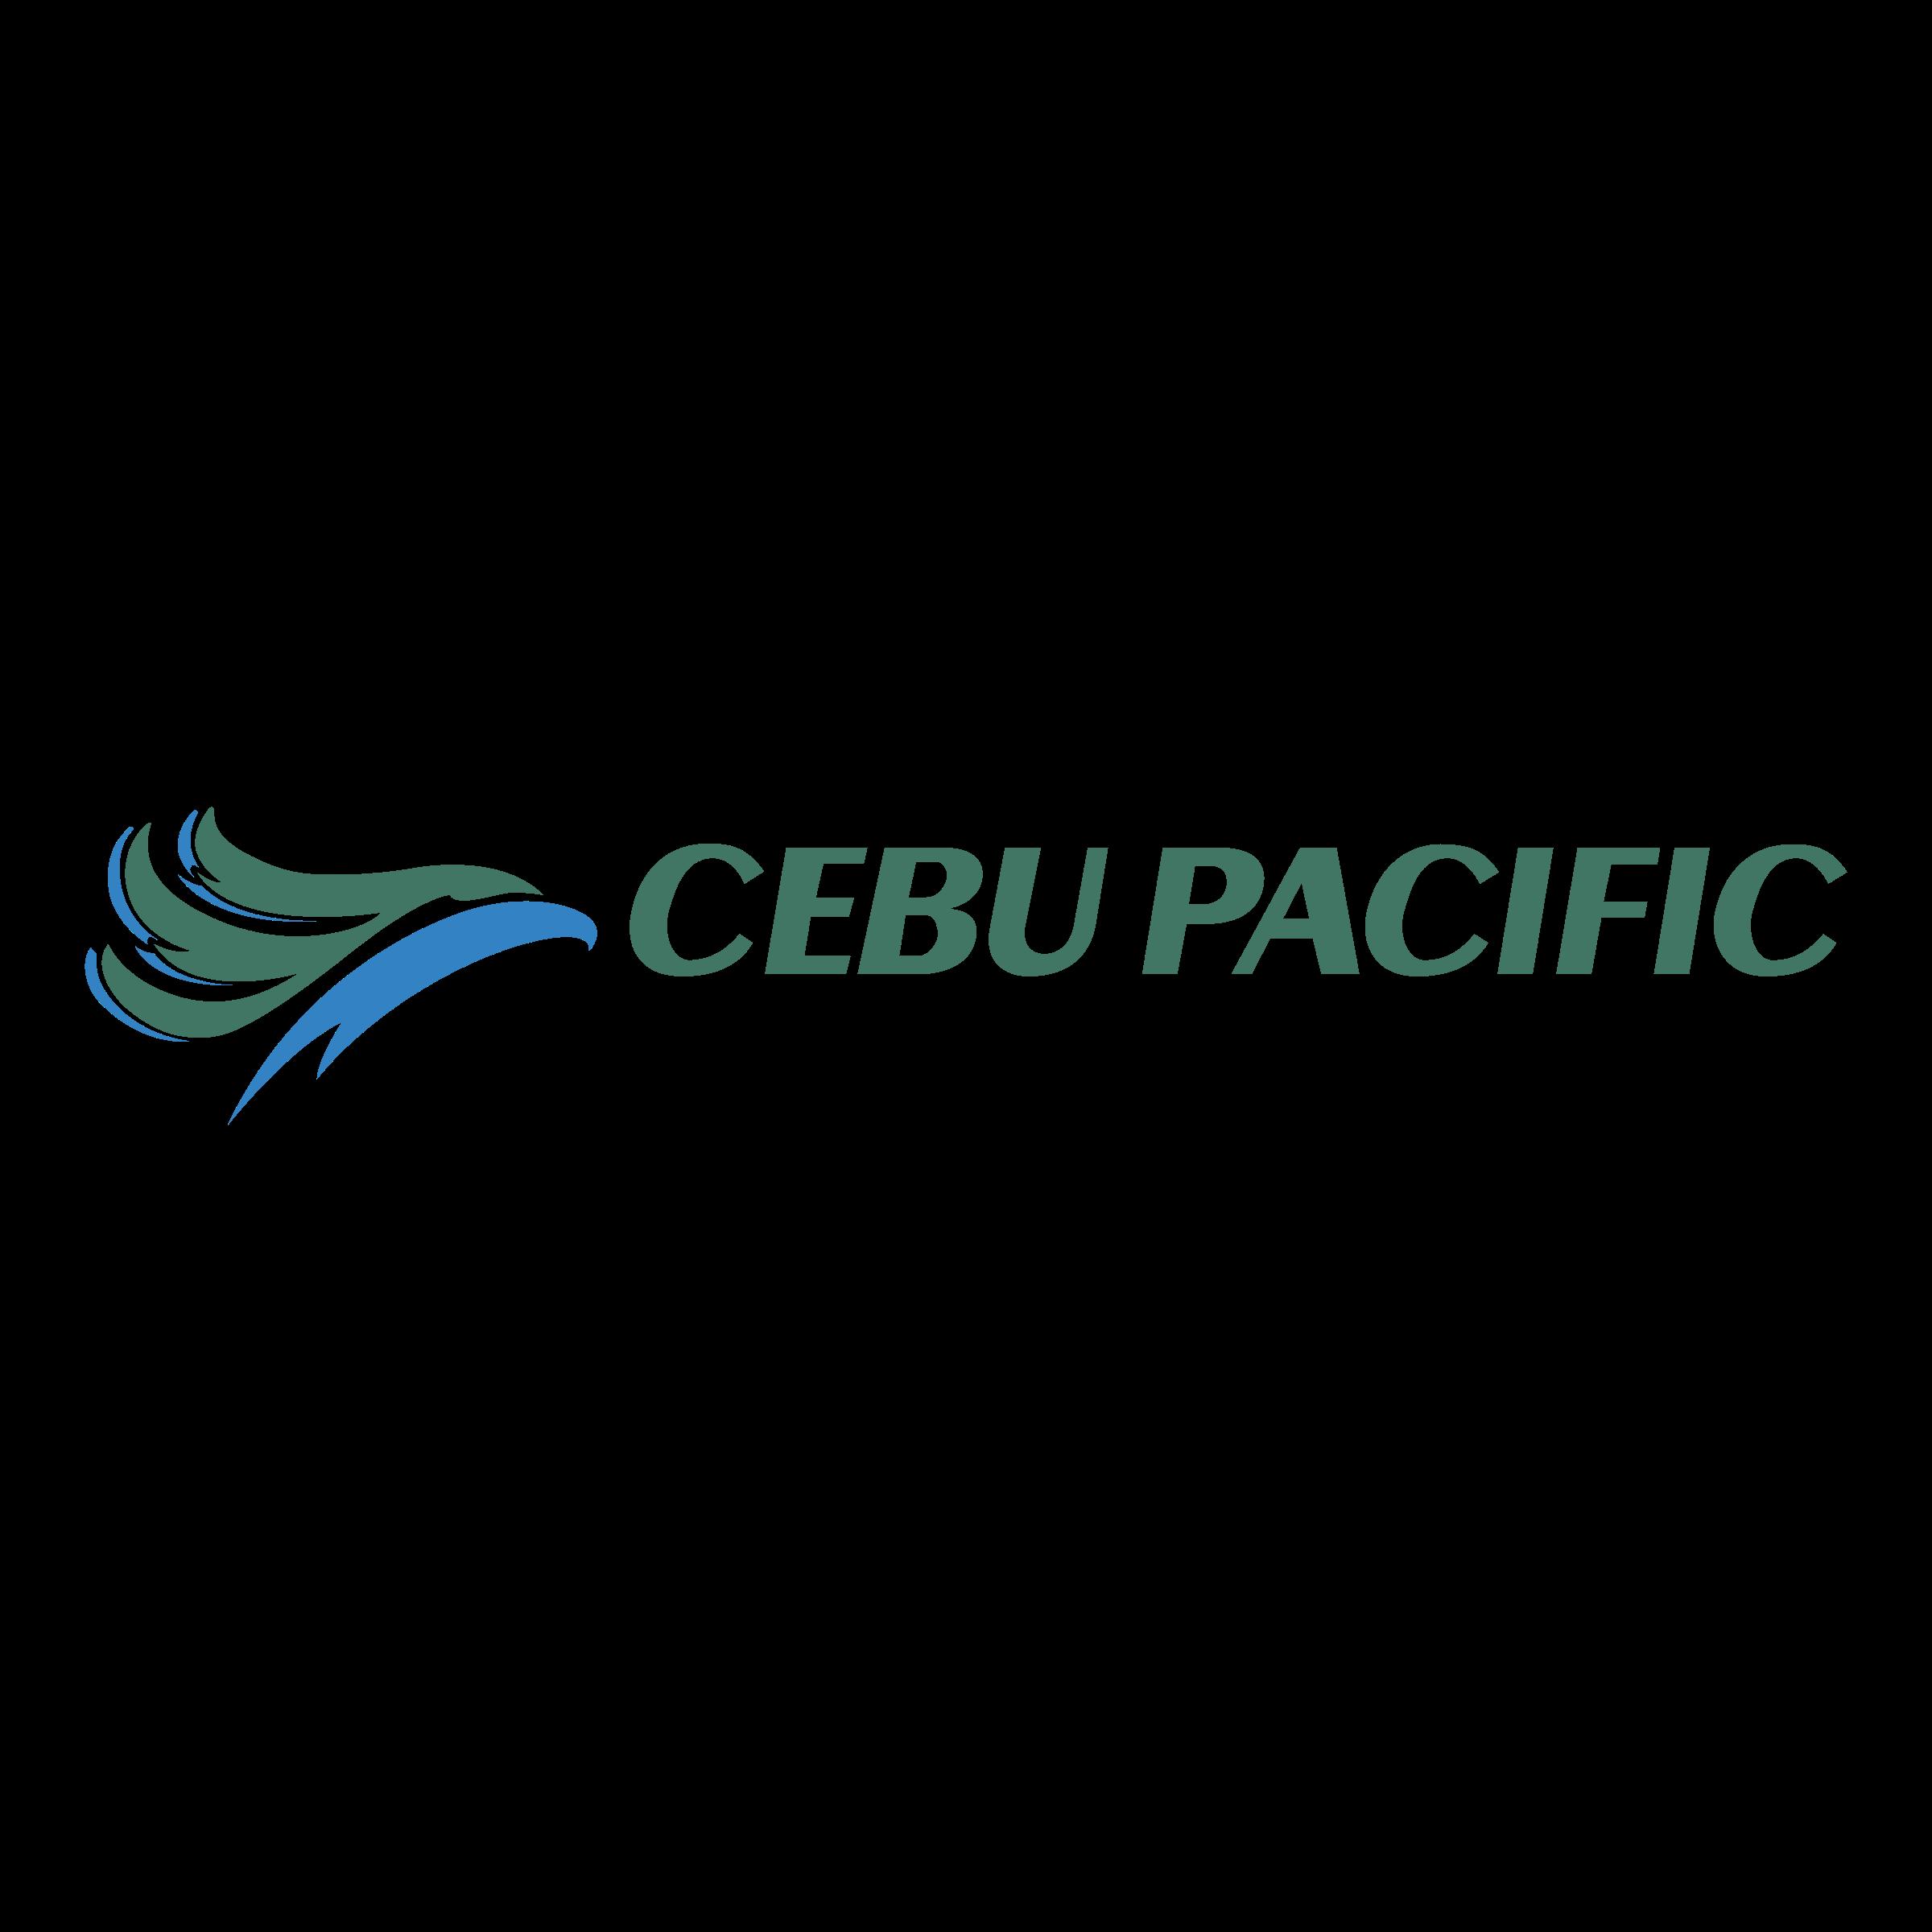 Cebu Pacific Air Logo PNG Transparent & SVG Vector.